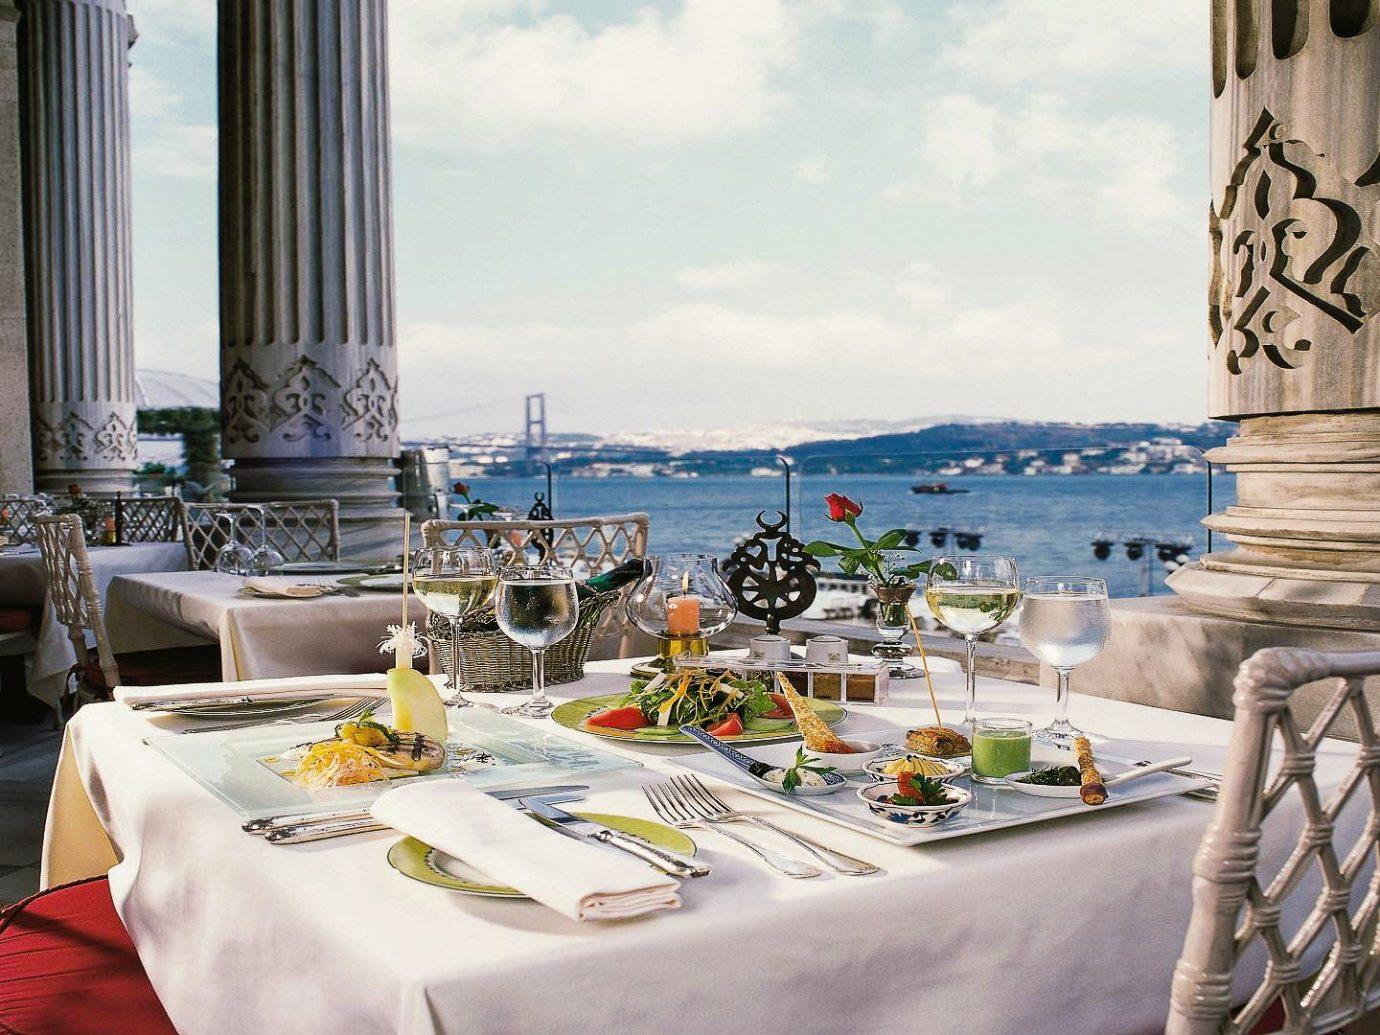 Boutique Hotels Hotels Luxury Travel restaurant interior design table